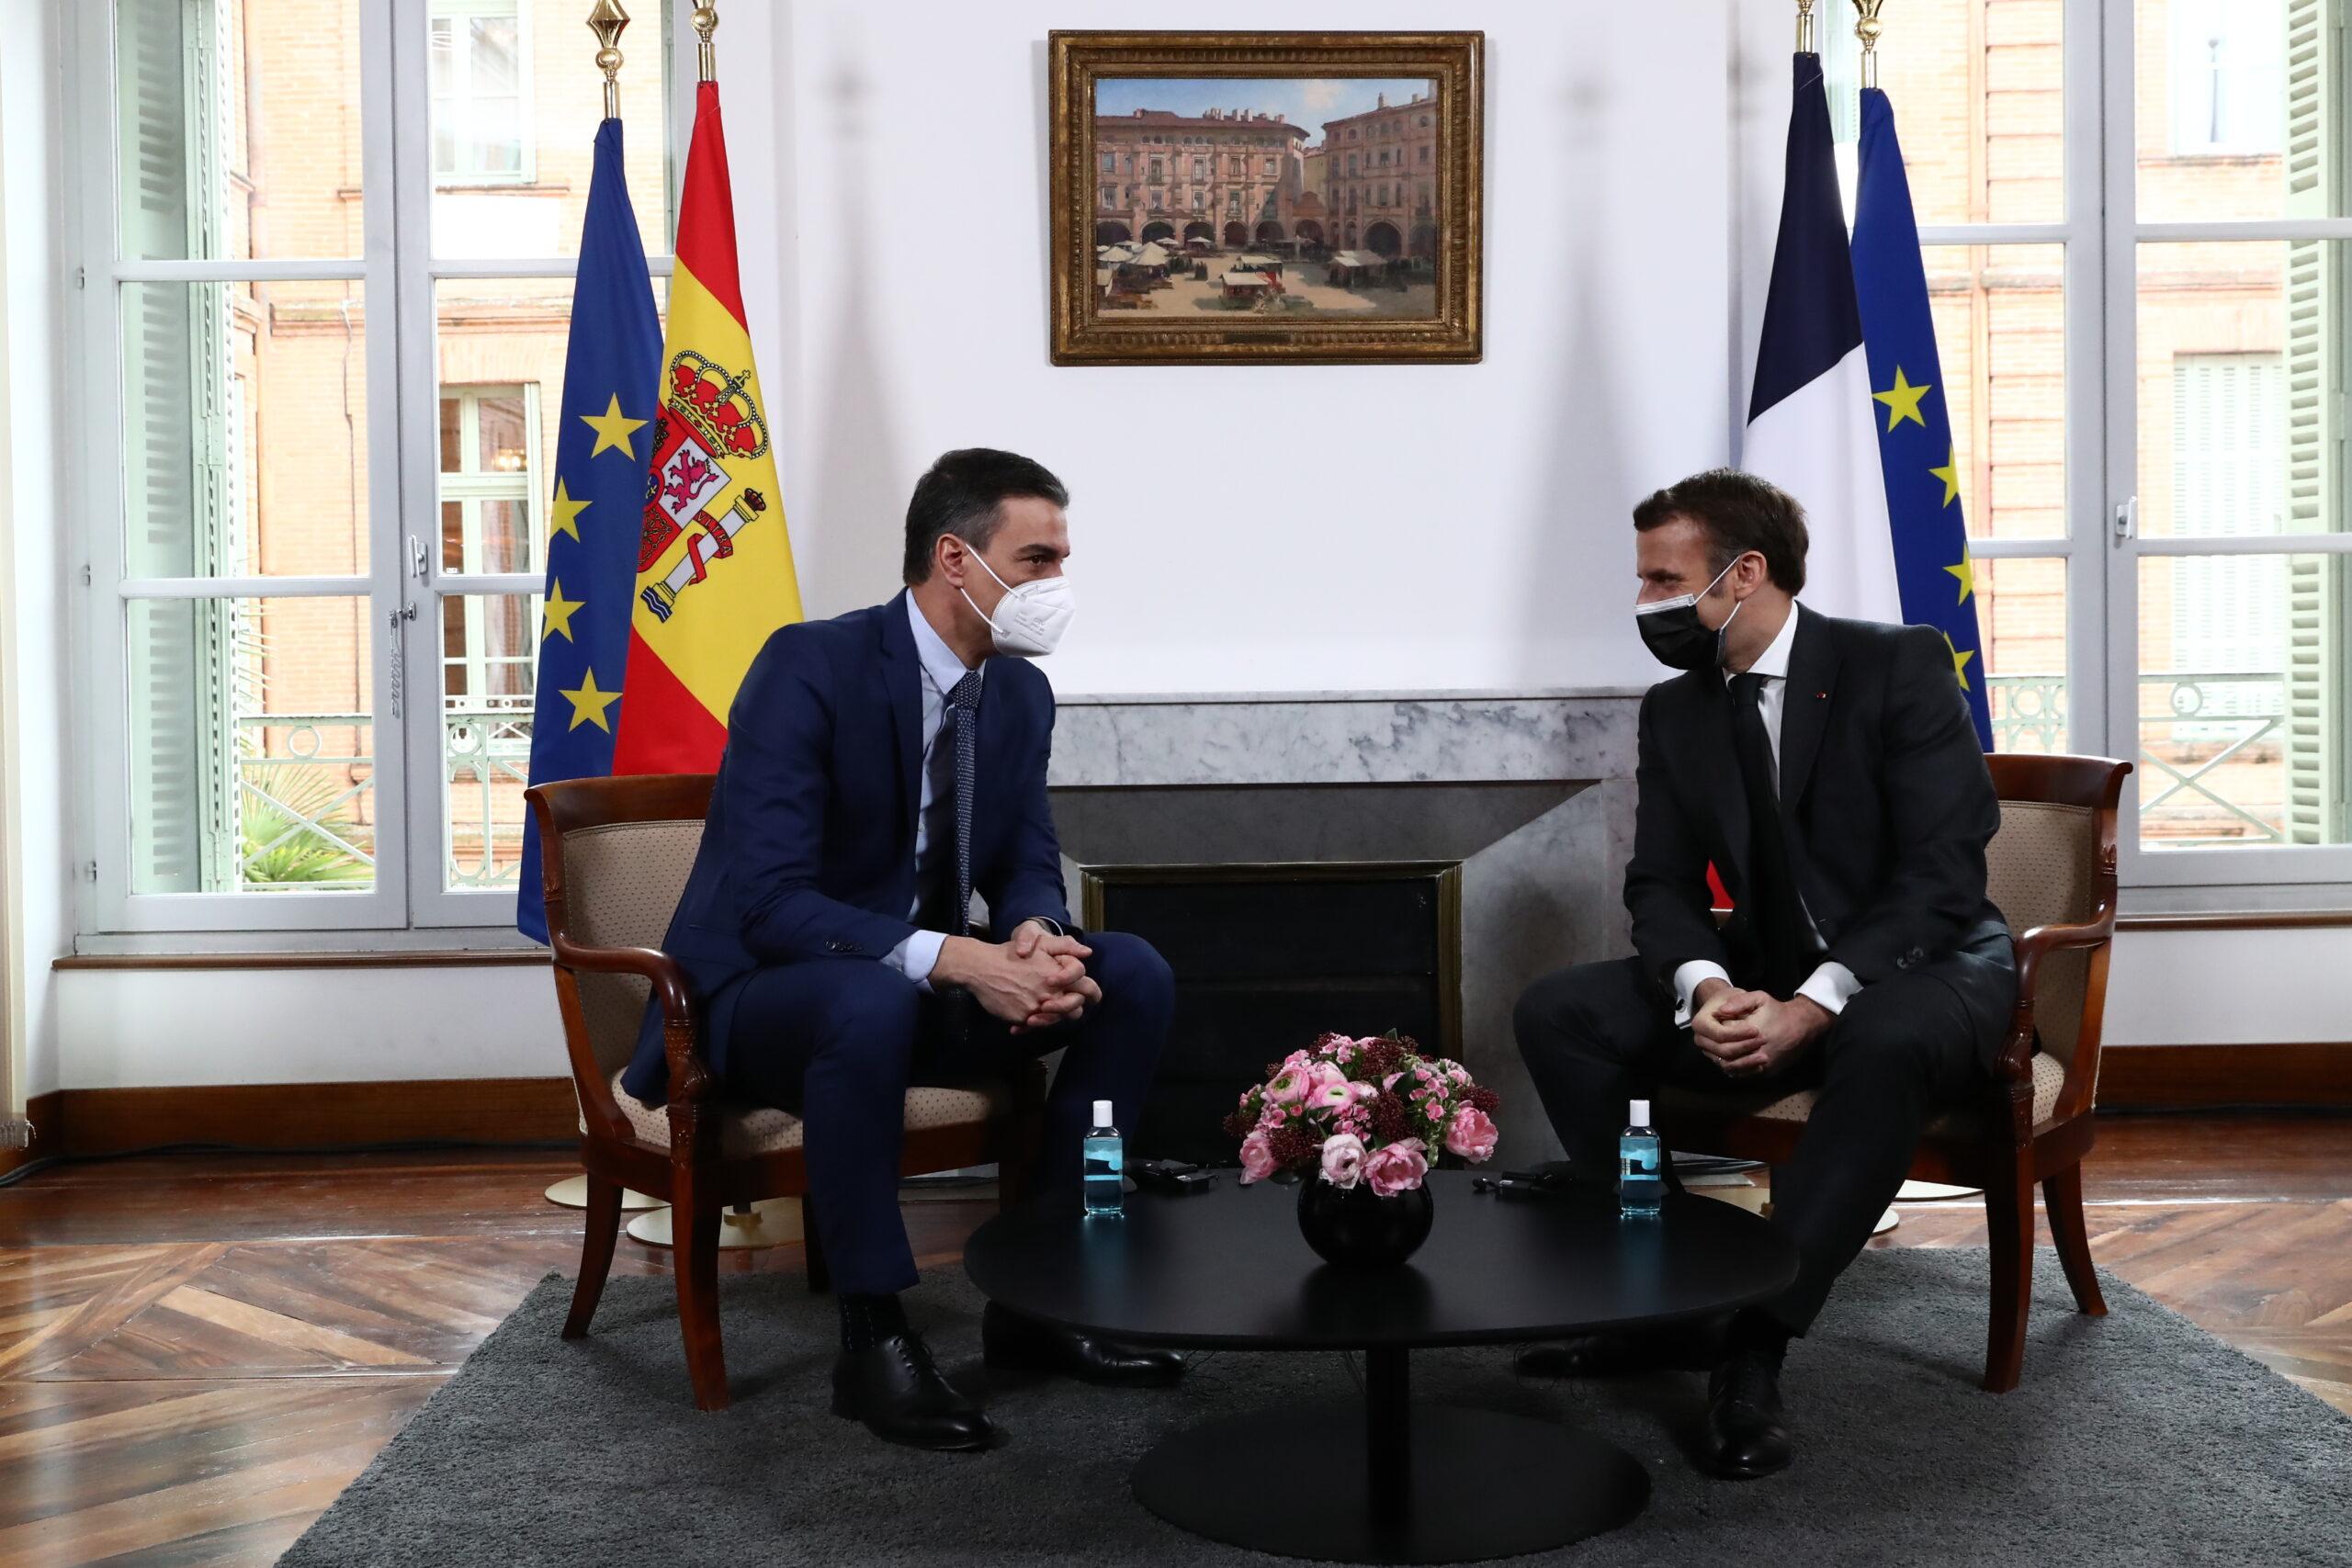 El president del govern espanyol, Pedro Sánchez amb el president de la República Francesa, Emmanuel Macron